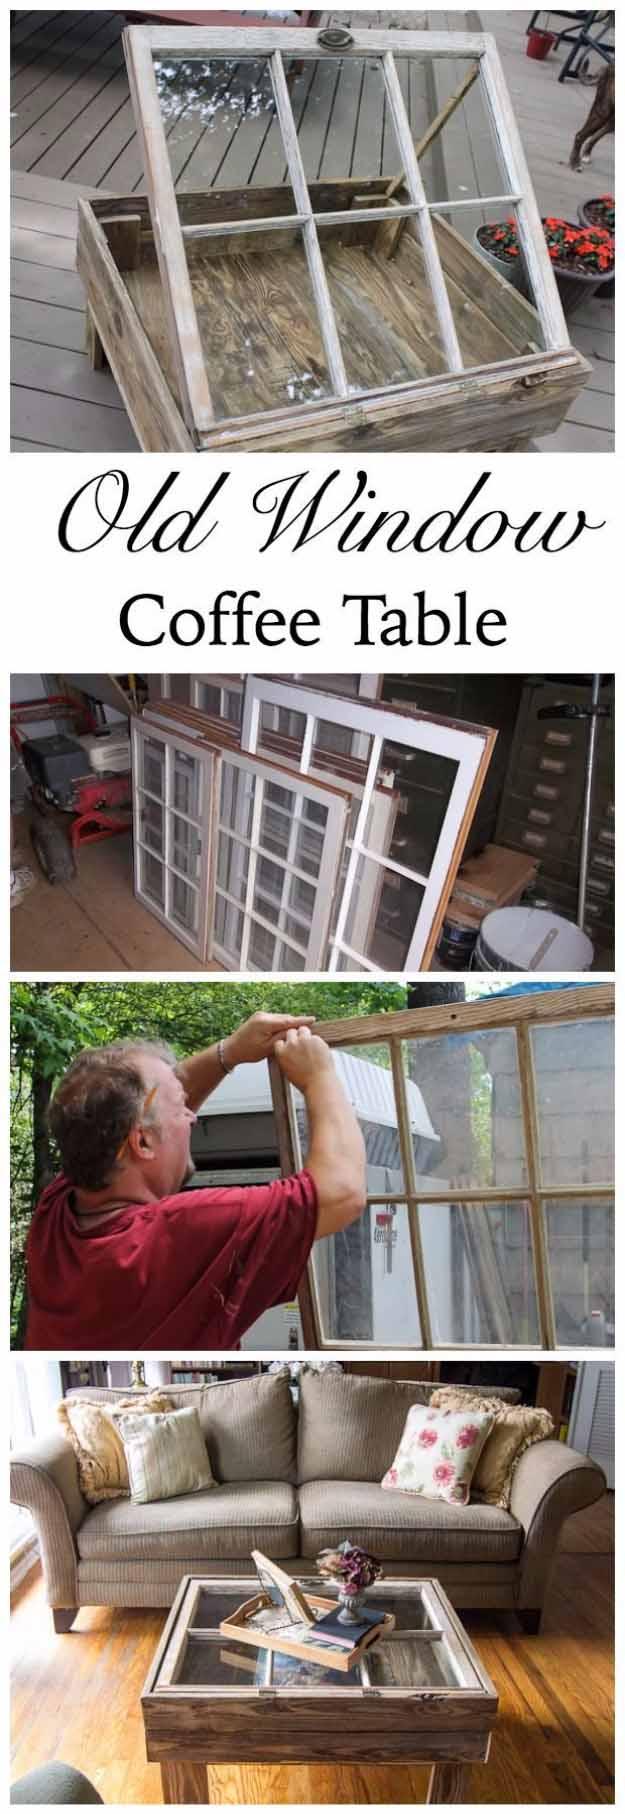 15 Insane DIY Coffee Table Ideas 4